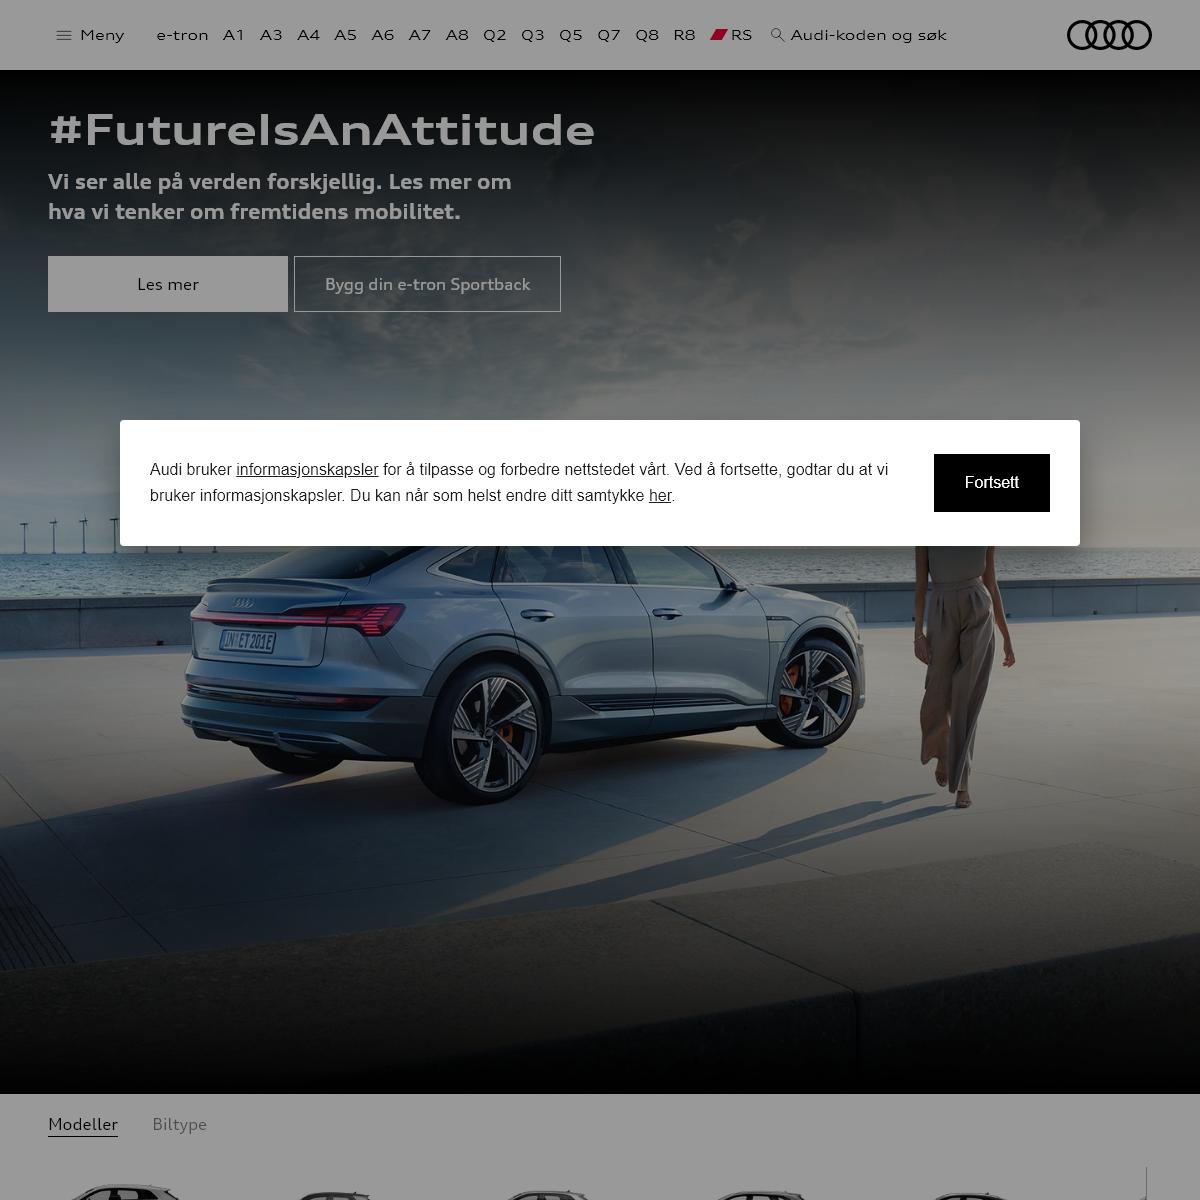 Audi Norge